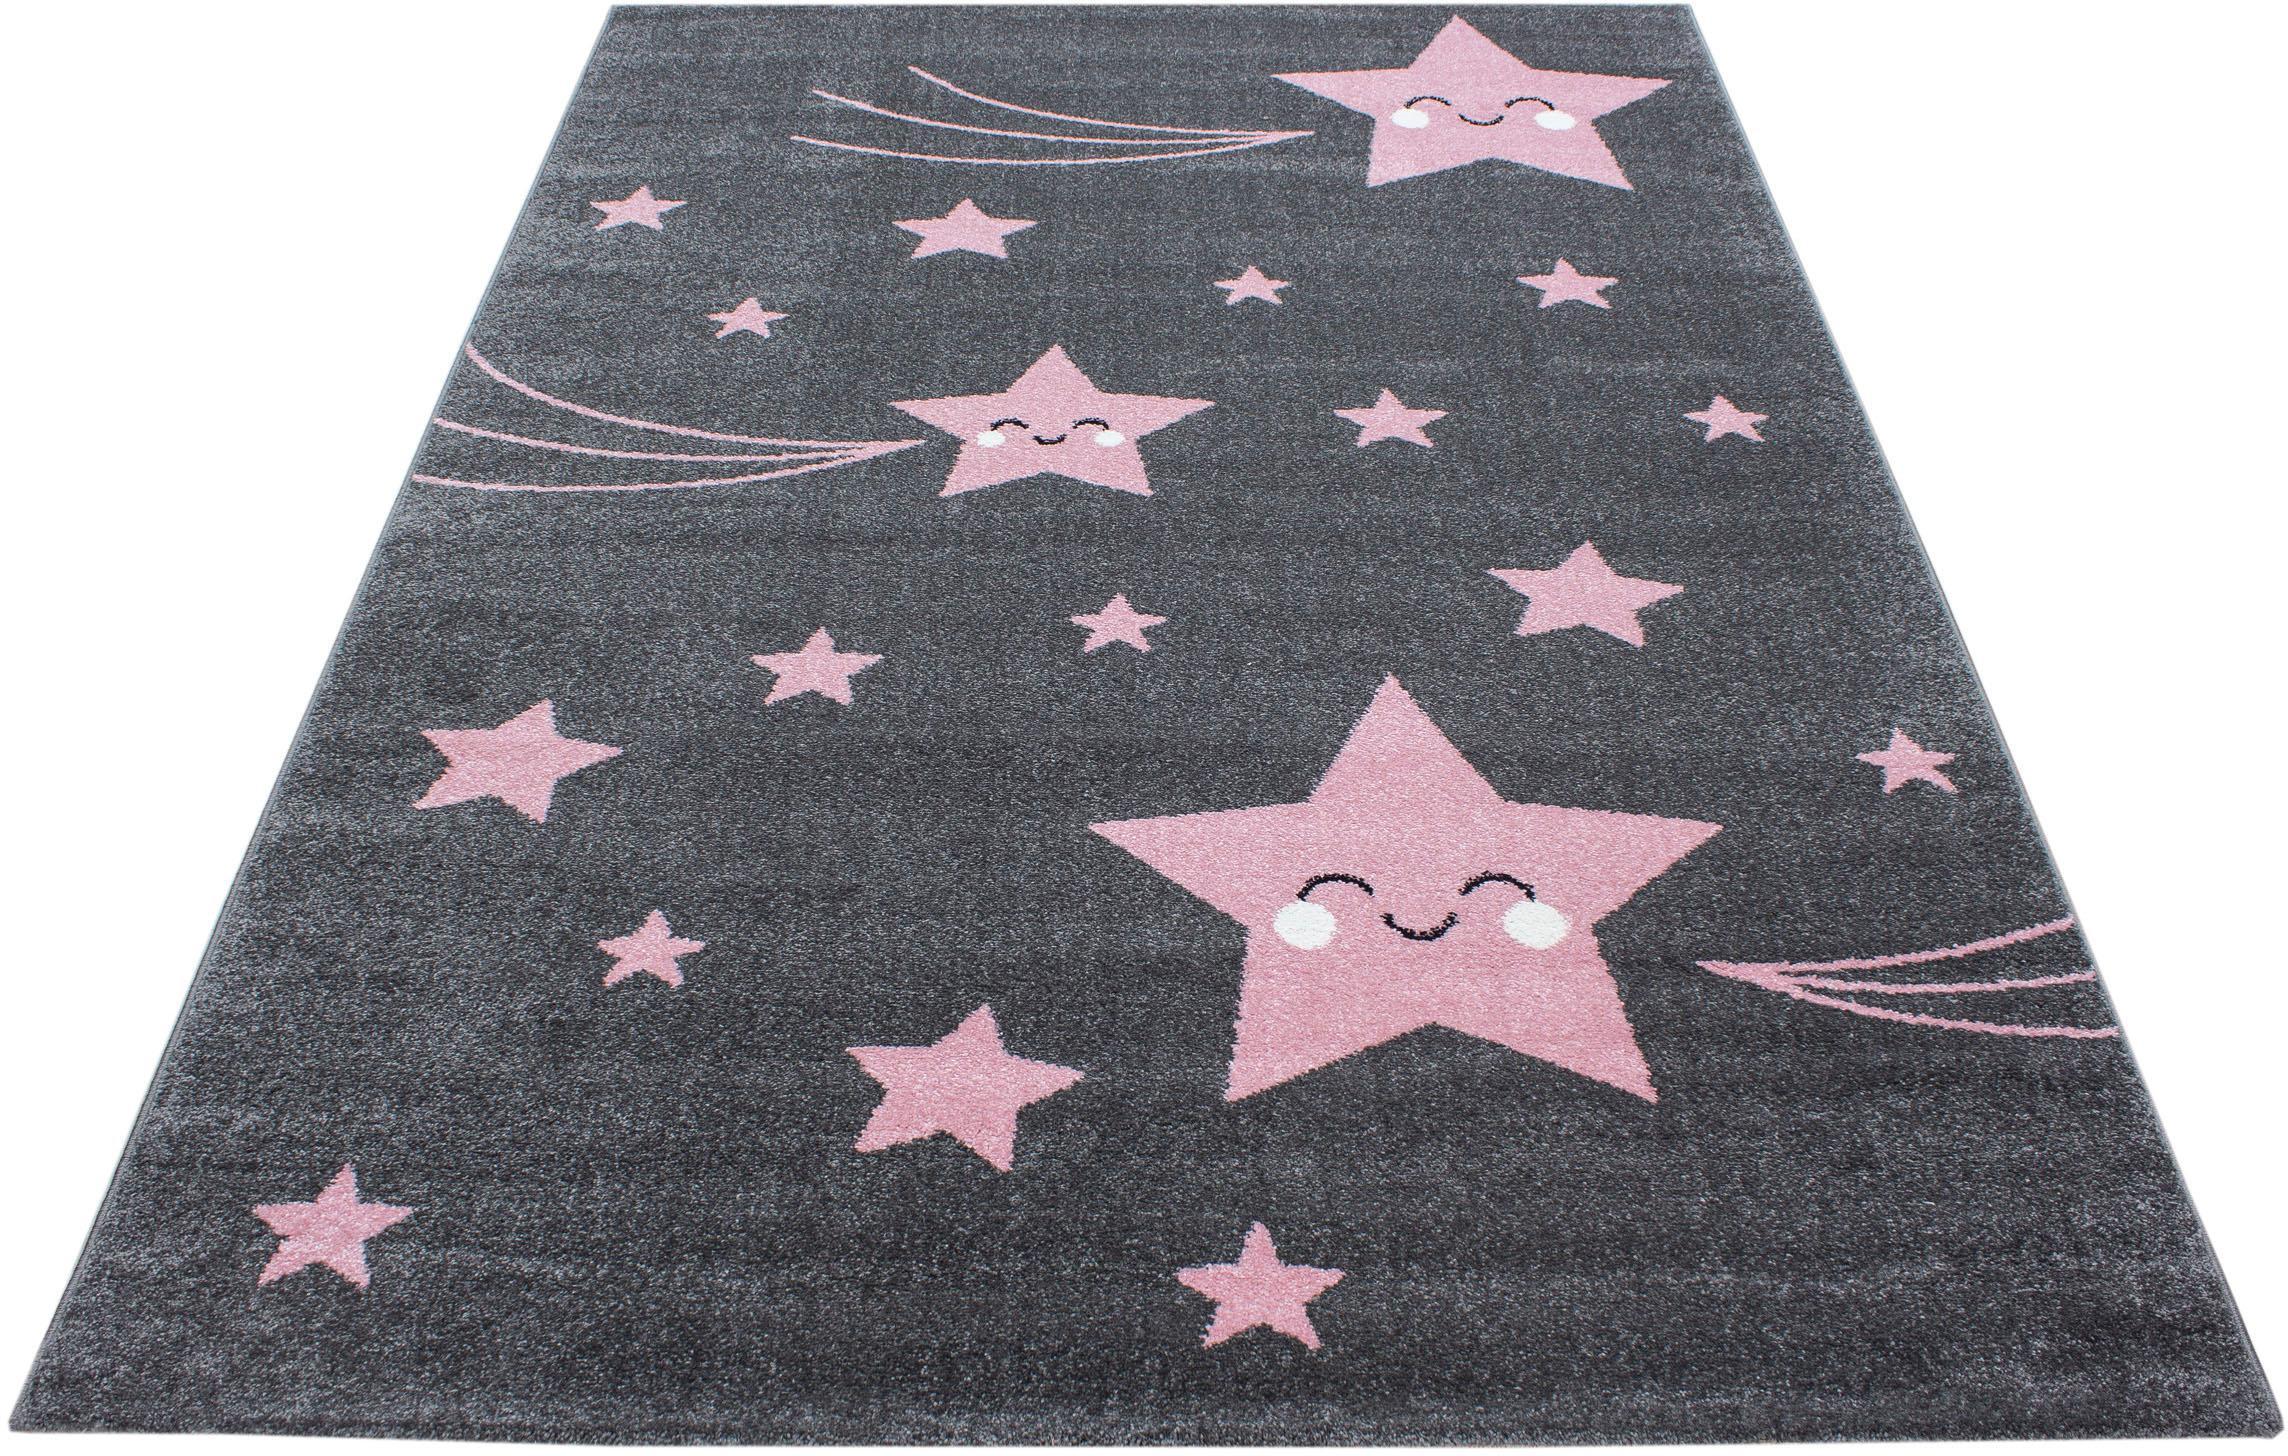 Kinderteppich Kids 610 Ayyildiz rechteckig Höhe 12 mm maschinell gewebt